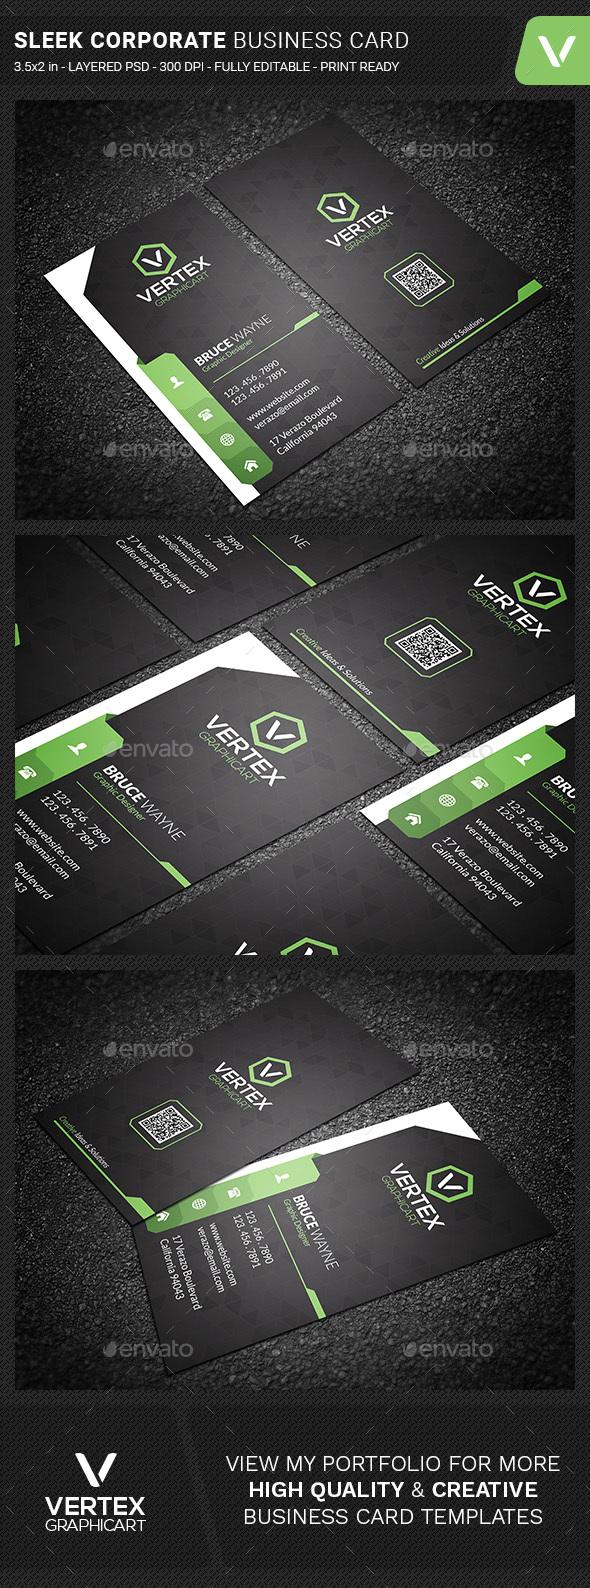 Sleek Corporate Business Card - Corporate Business Cards